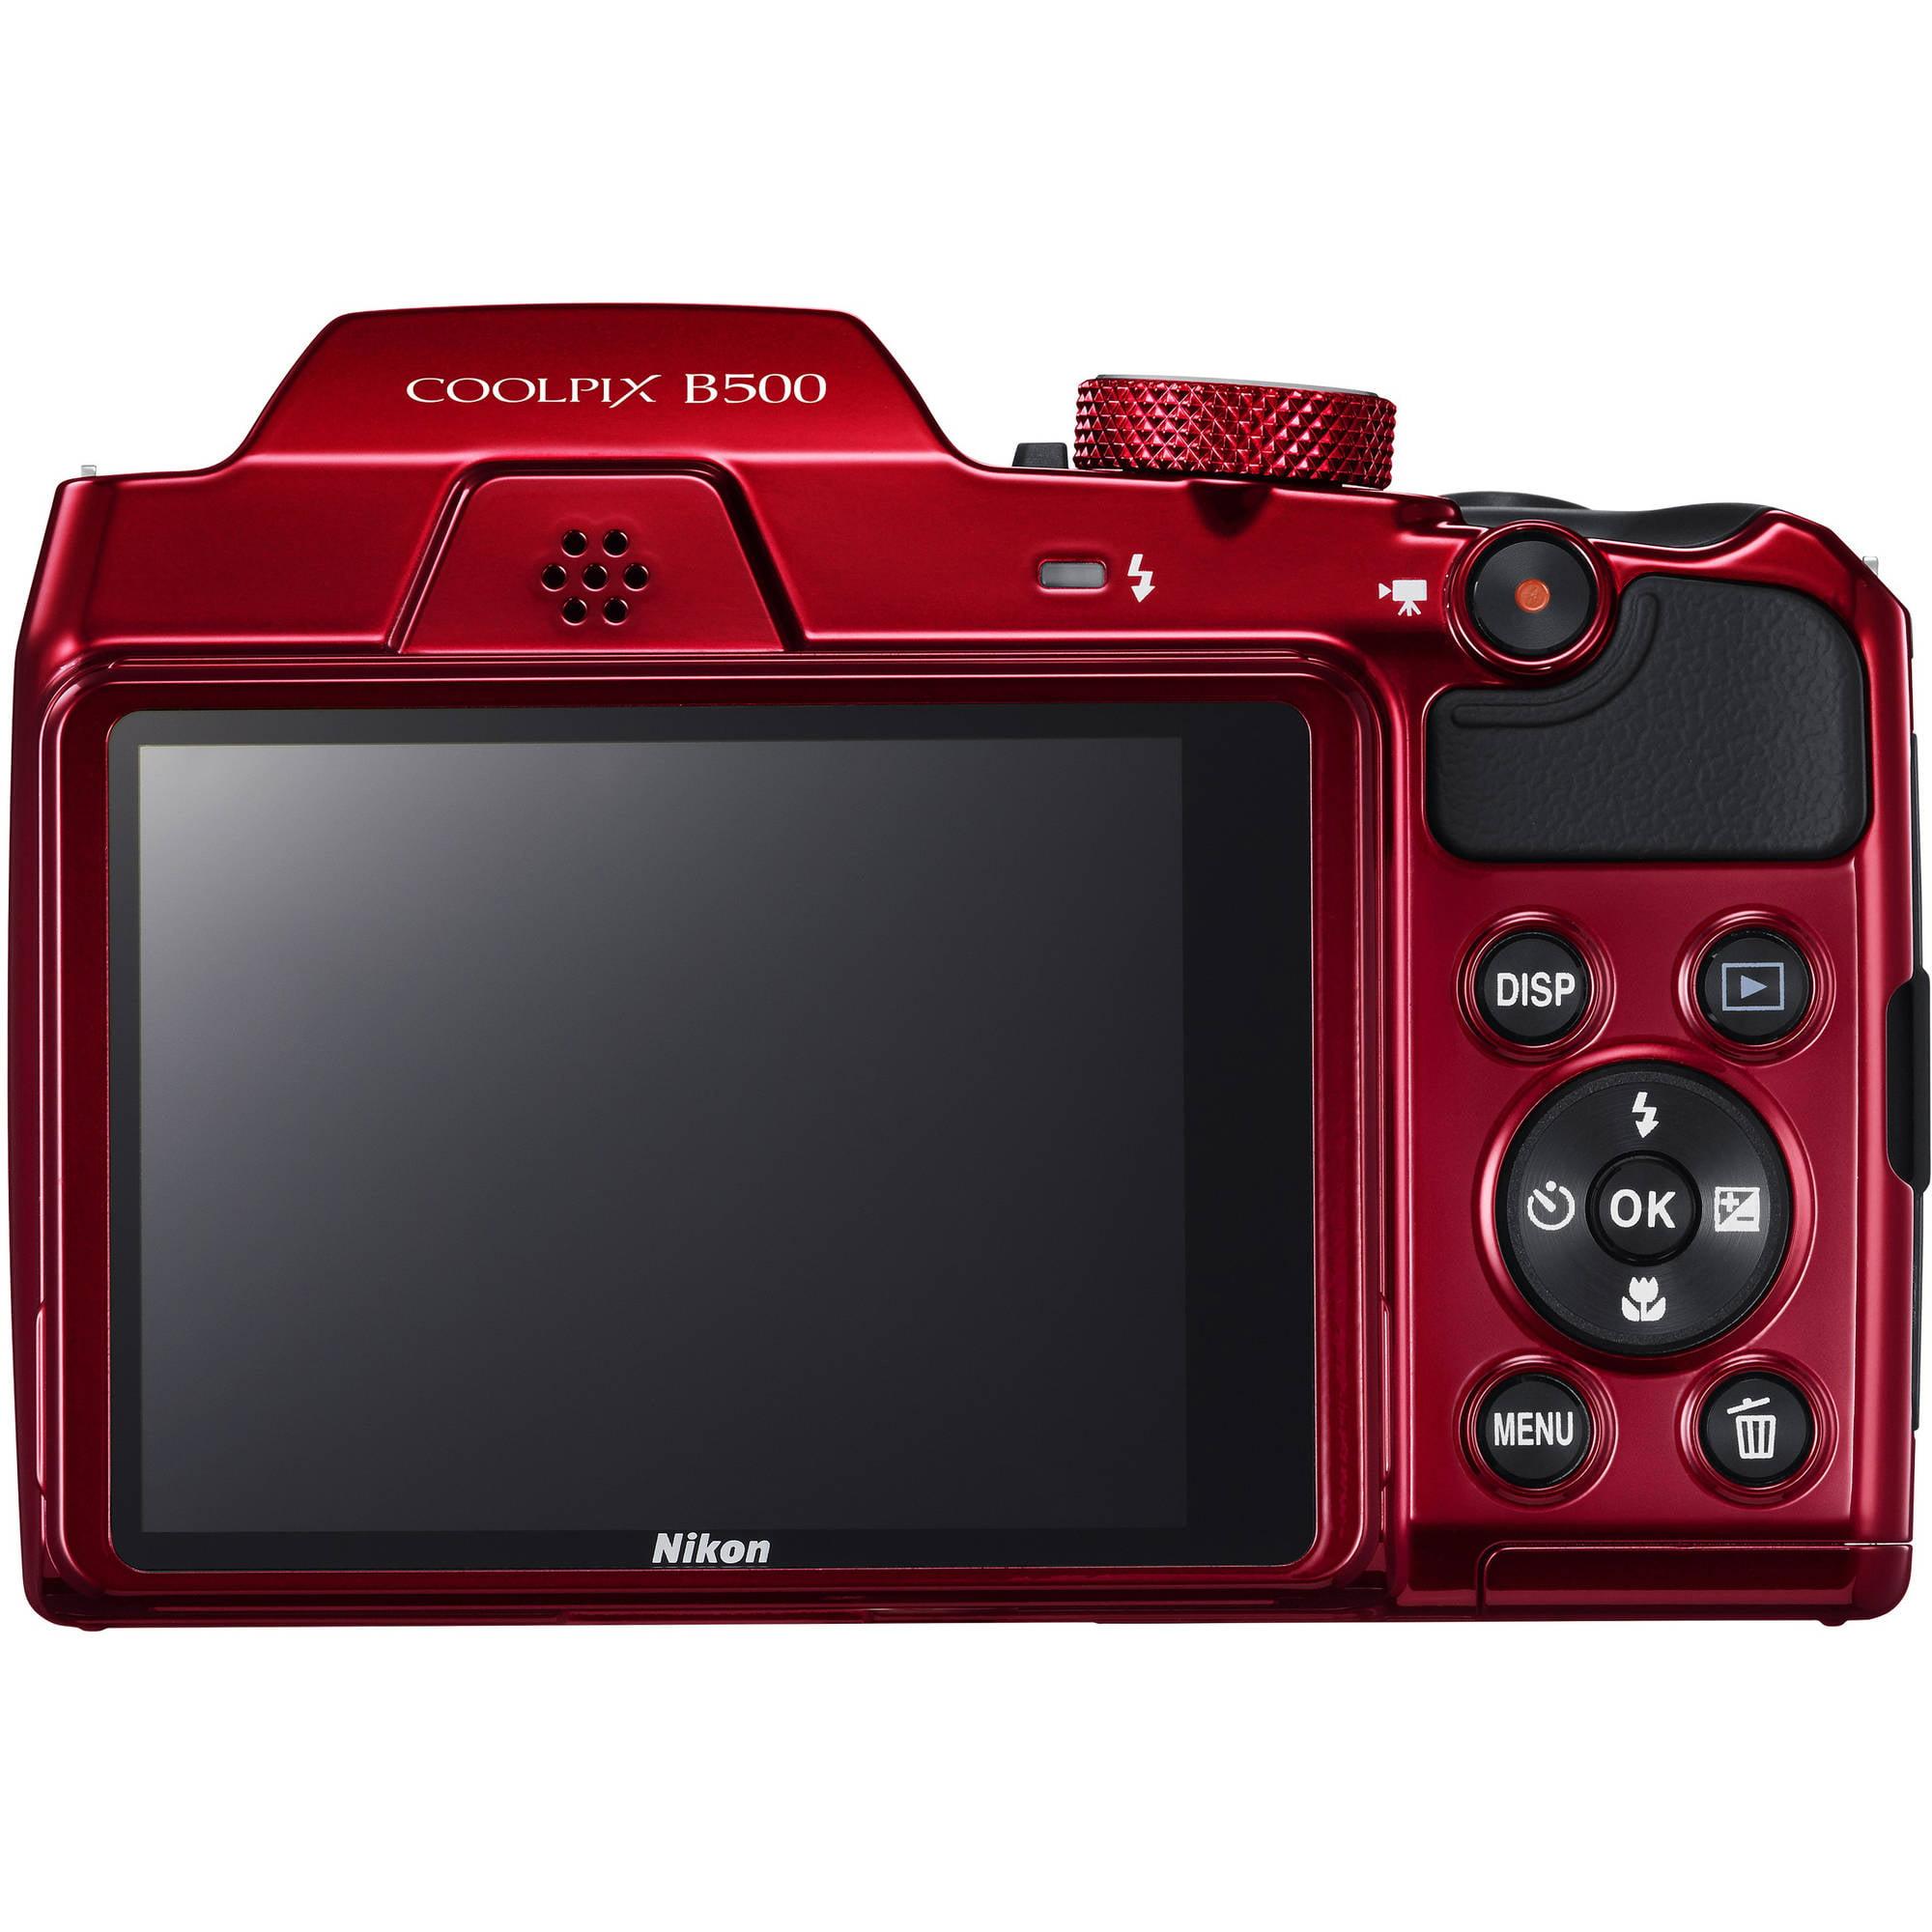 Nikon Red COOLPIX B500 Digital Camera with 16 Megapixels and 40x ...